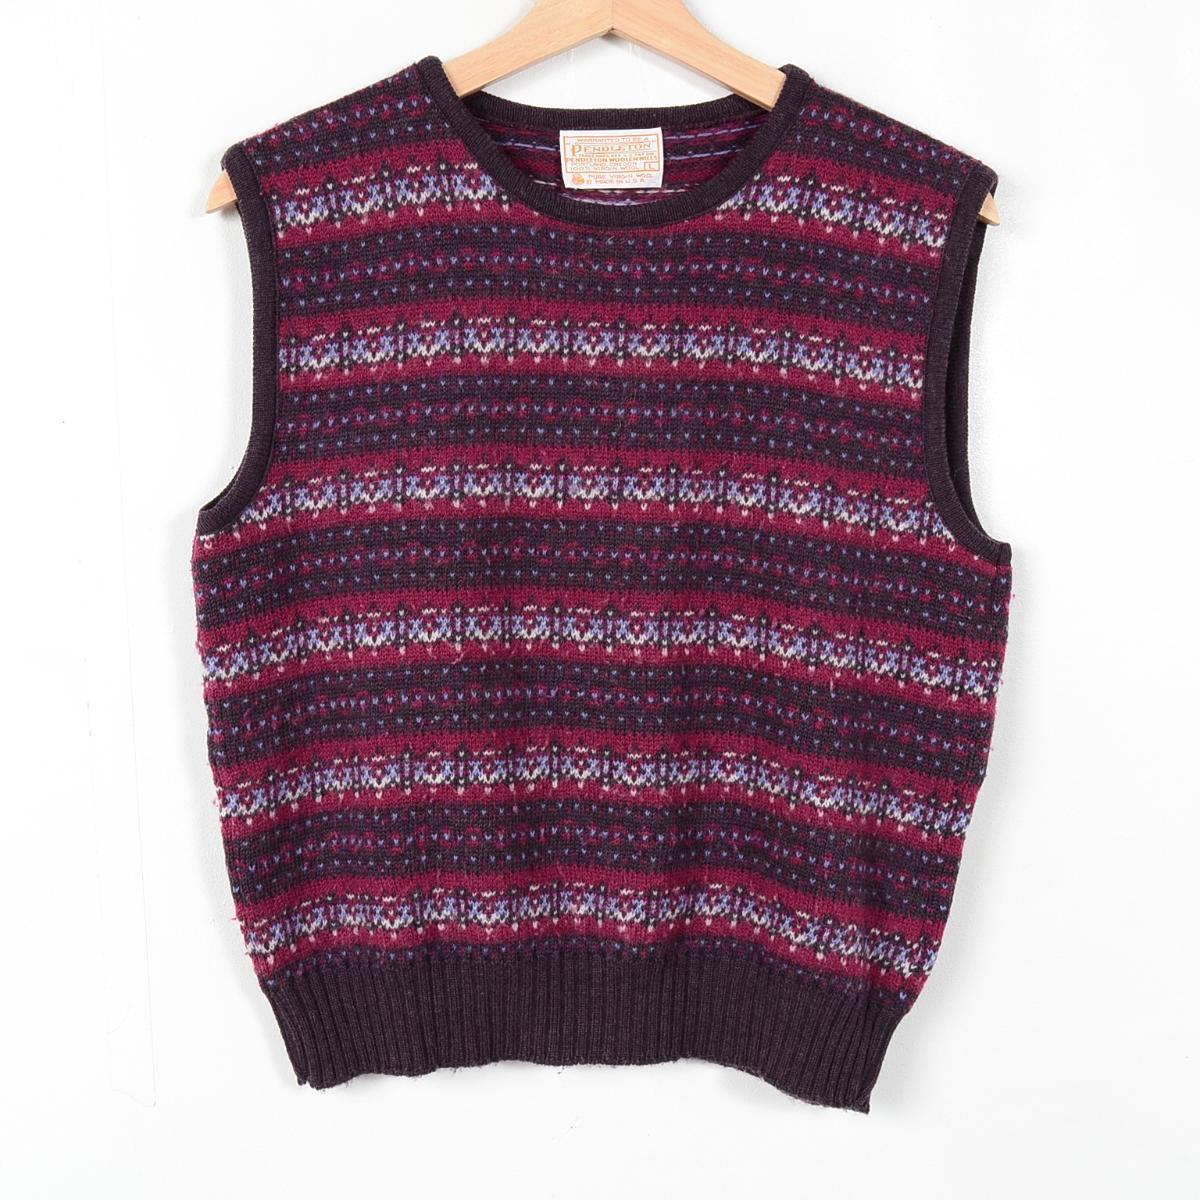 VINTAGE CLOTHING JAM | Rakuten Global Market: Fair Isle pattern ...